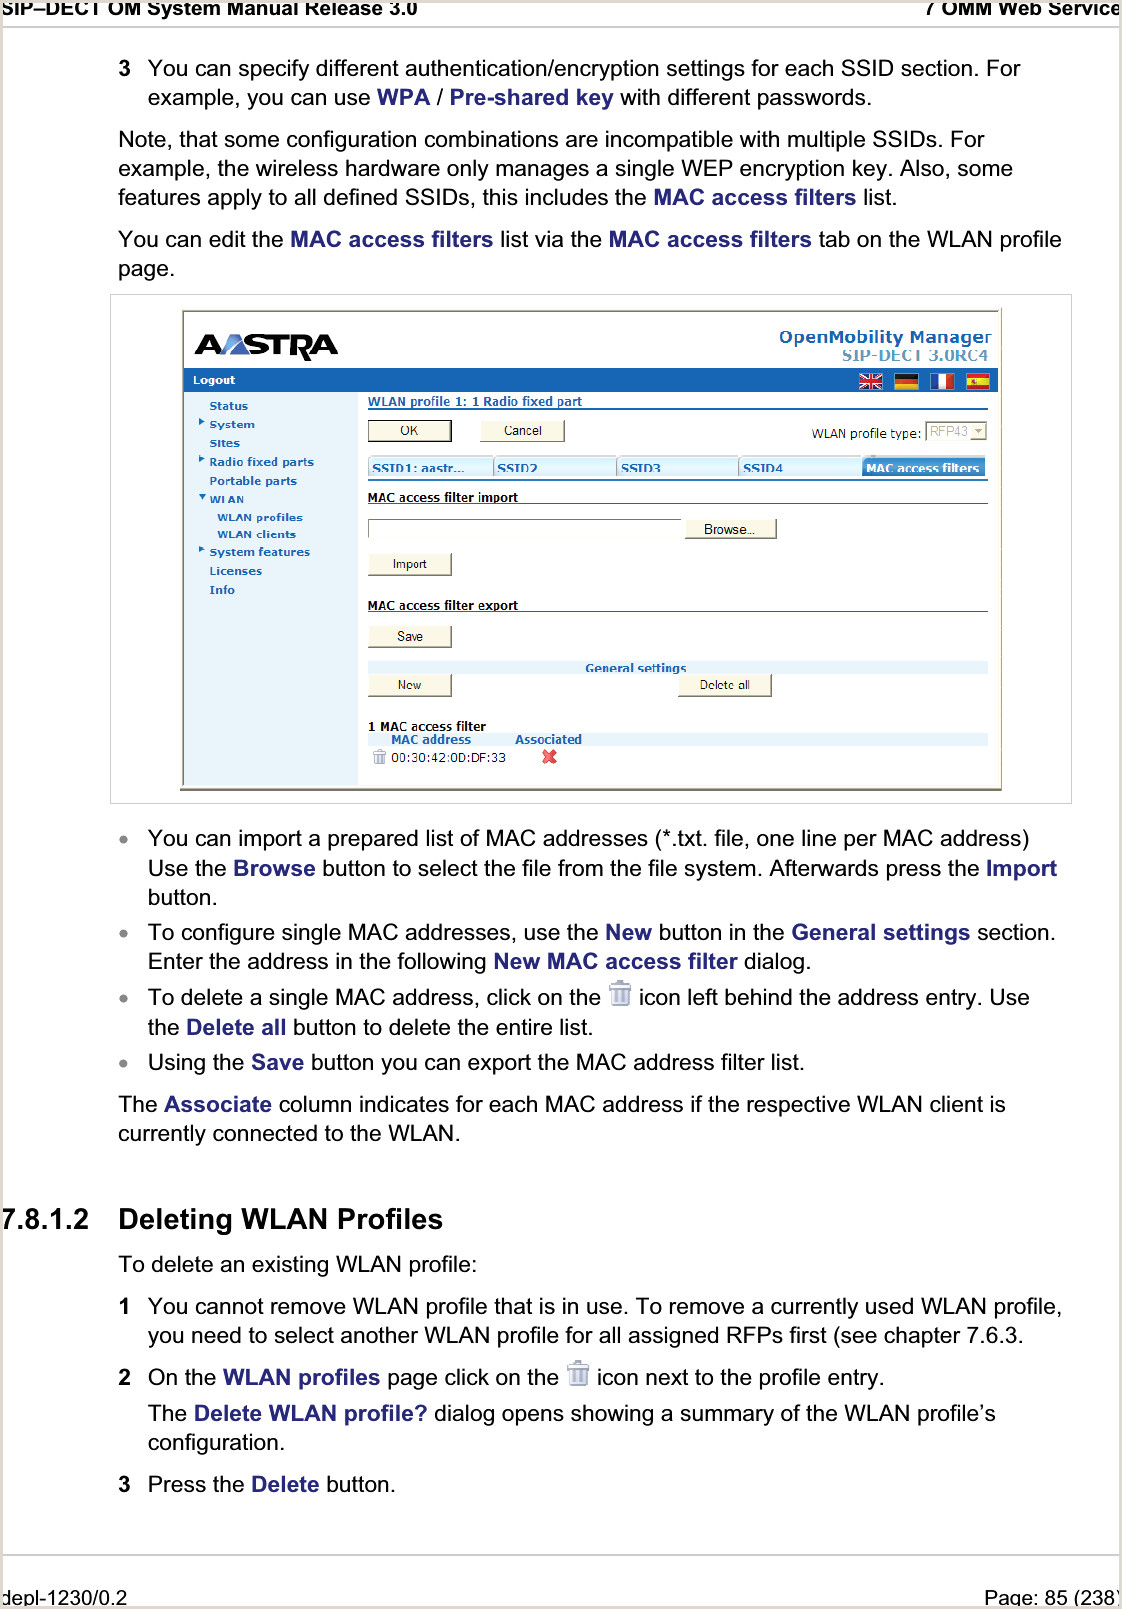 Standard Cv format for software Engineer Botsol for Mac